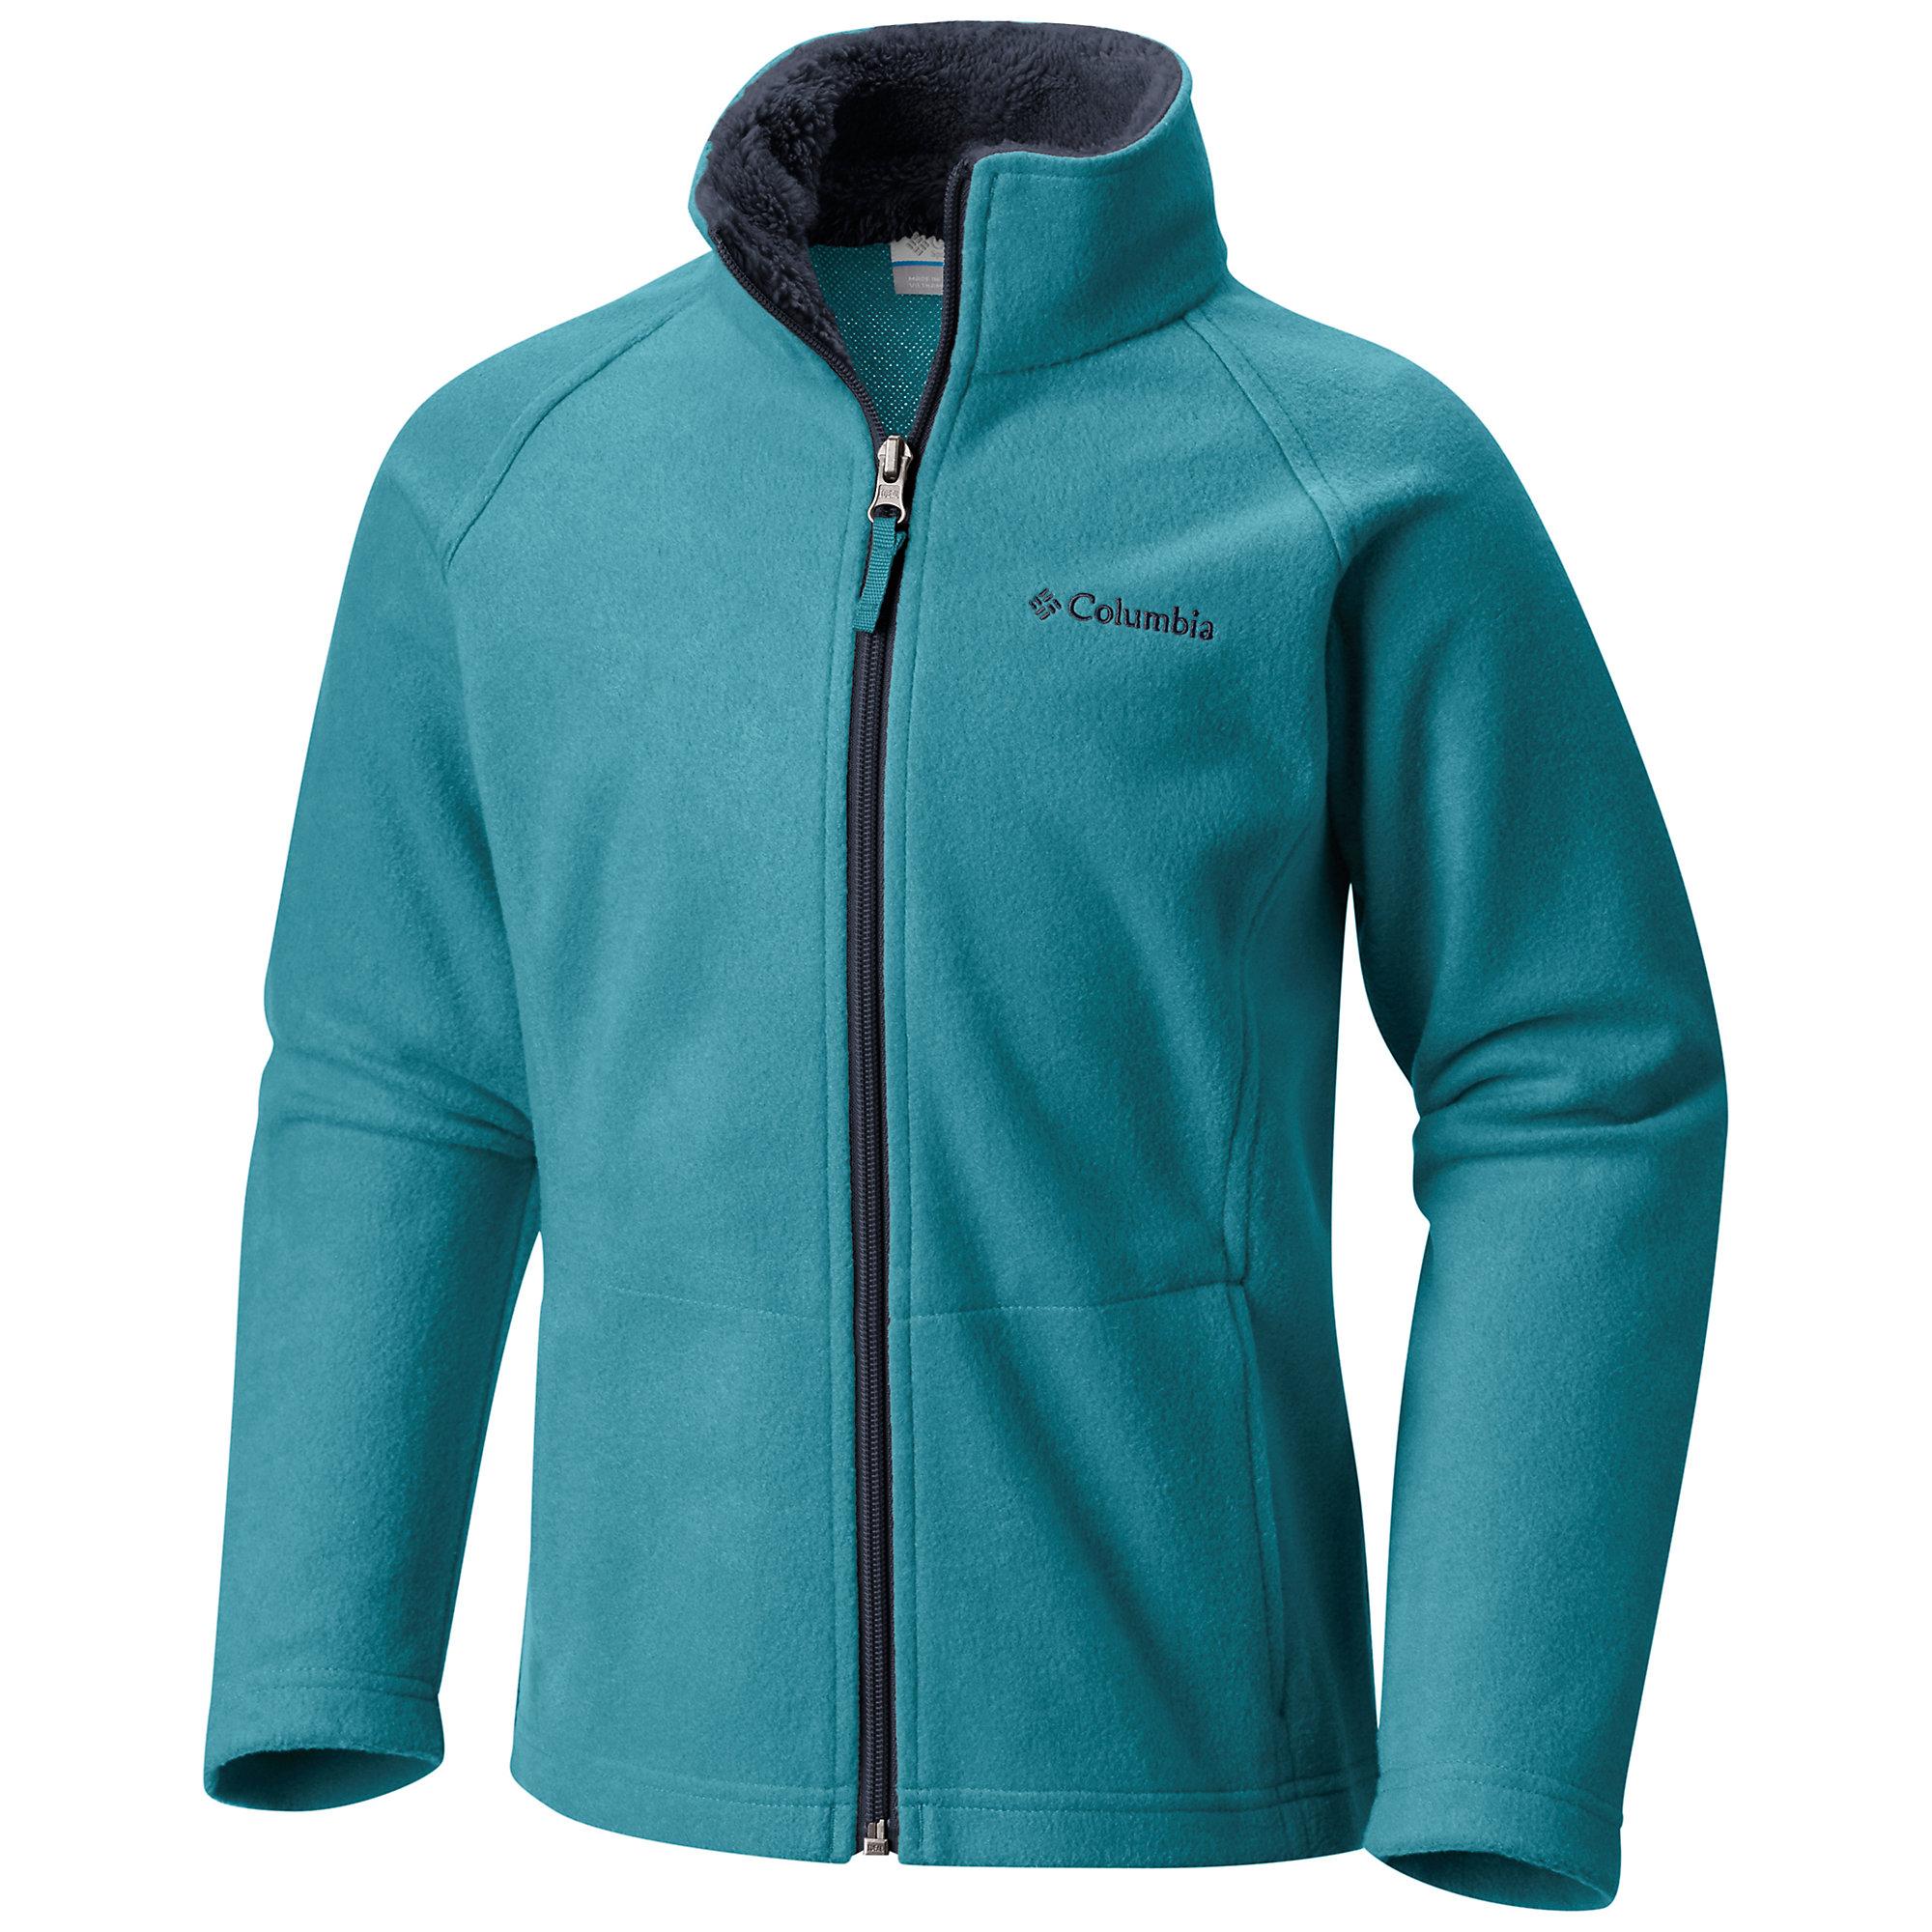 Columbia Dotswarm Full Zip Jacket